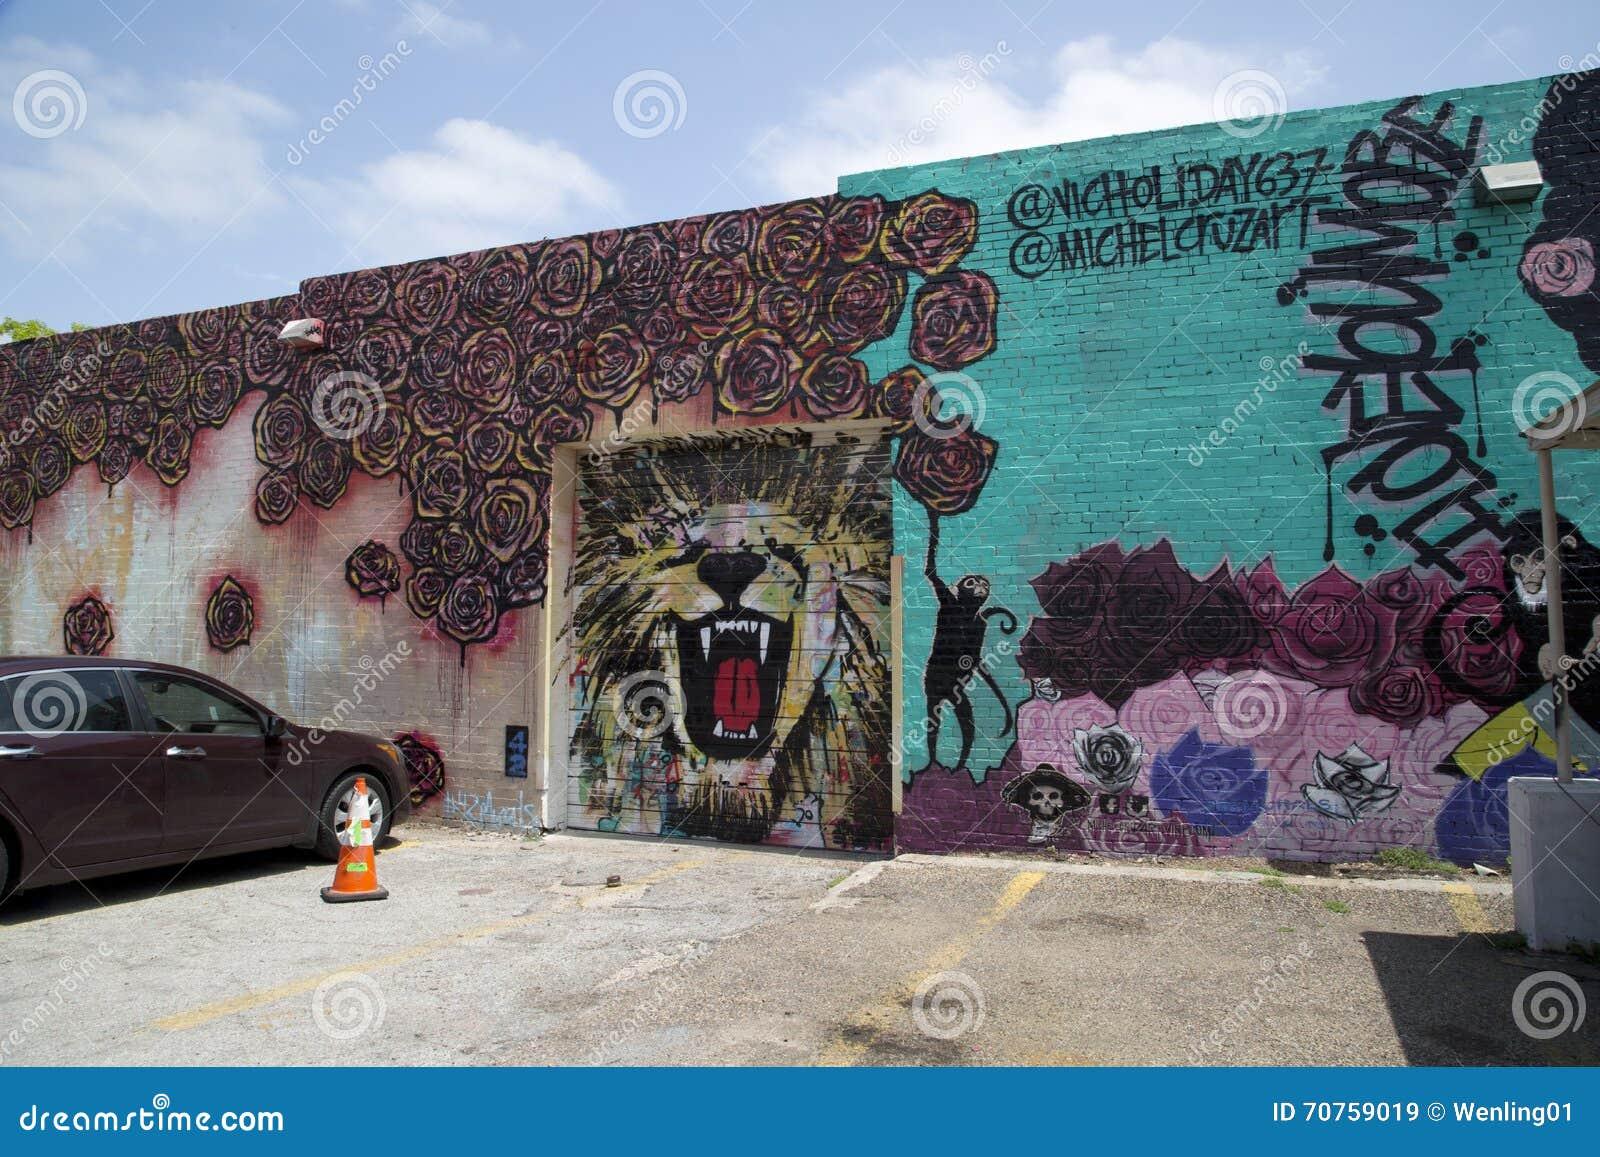 Graffiti wall dallas - Nice Colorful Graffiti On The Wall Royalty Free Stock Images